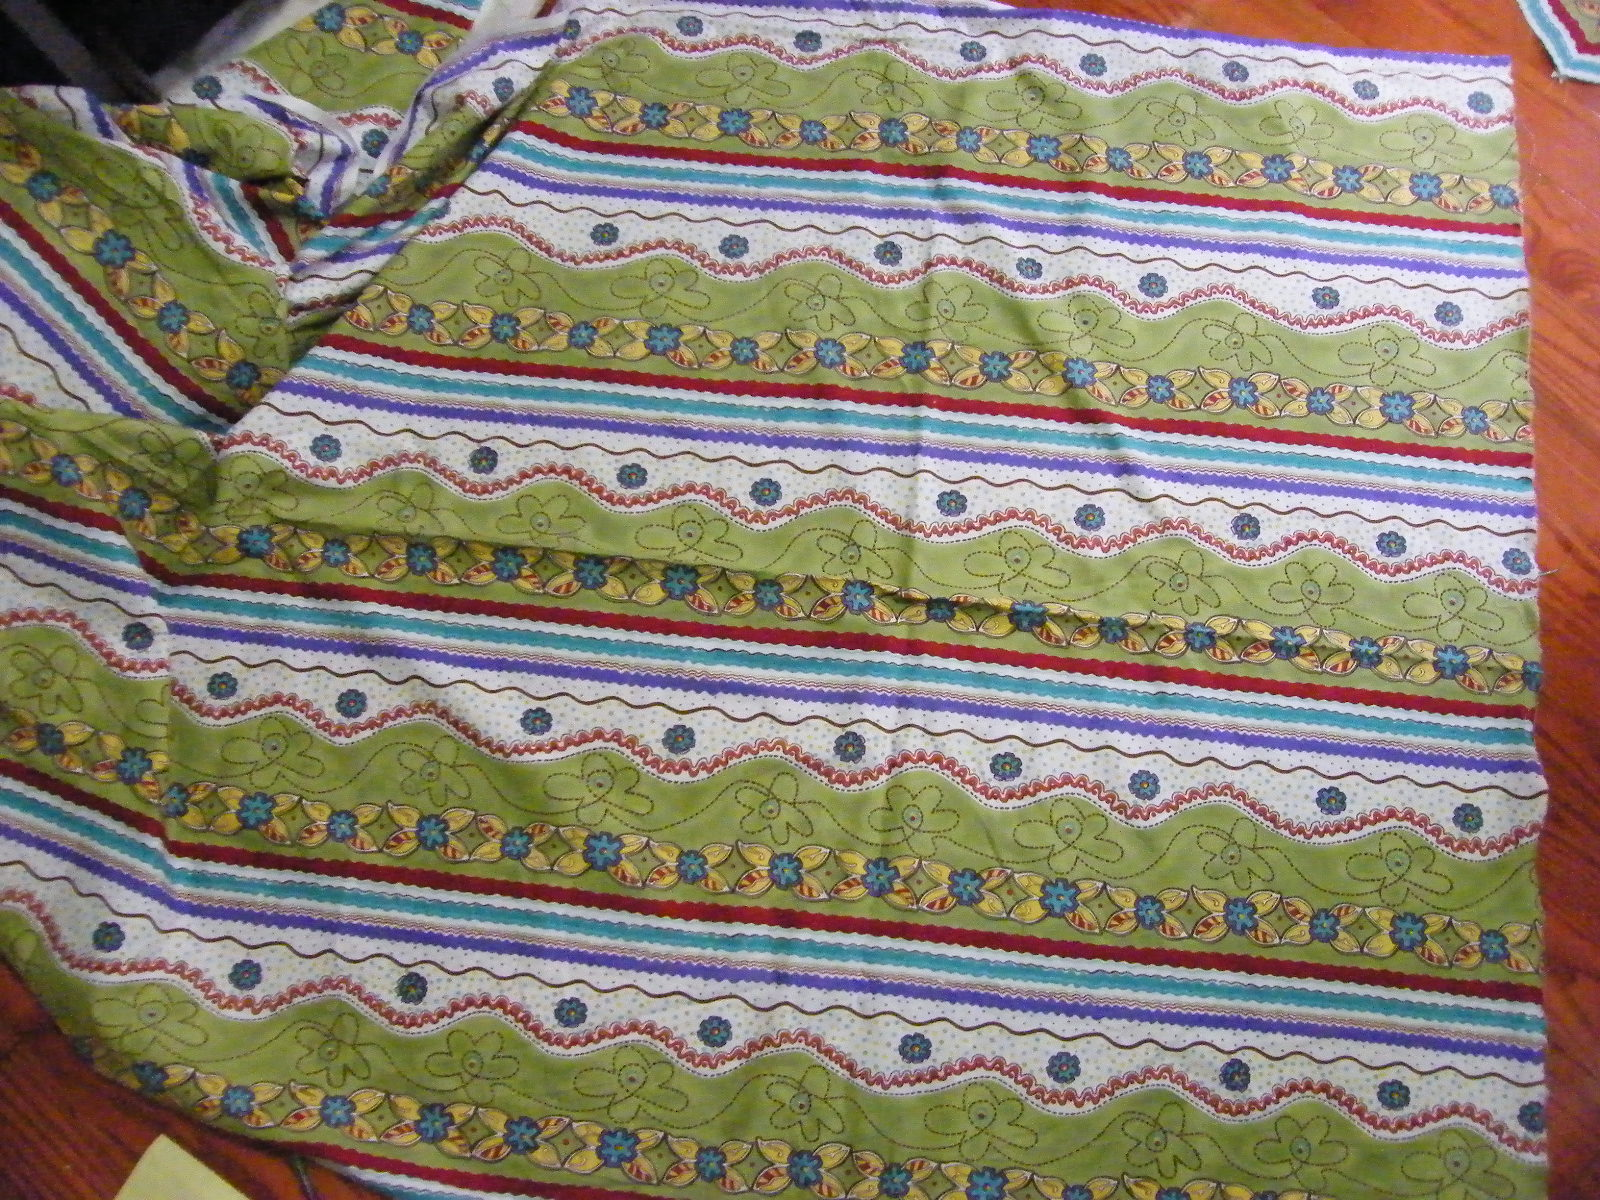 Quilt, Knit, Run, Sew: Border/Striped Tablerunners : quilt knit run sew - Adamdwight.com